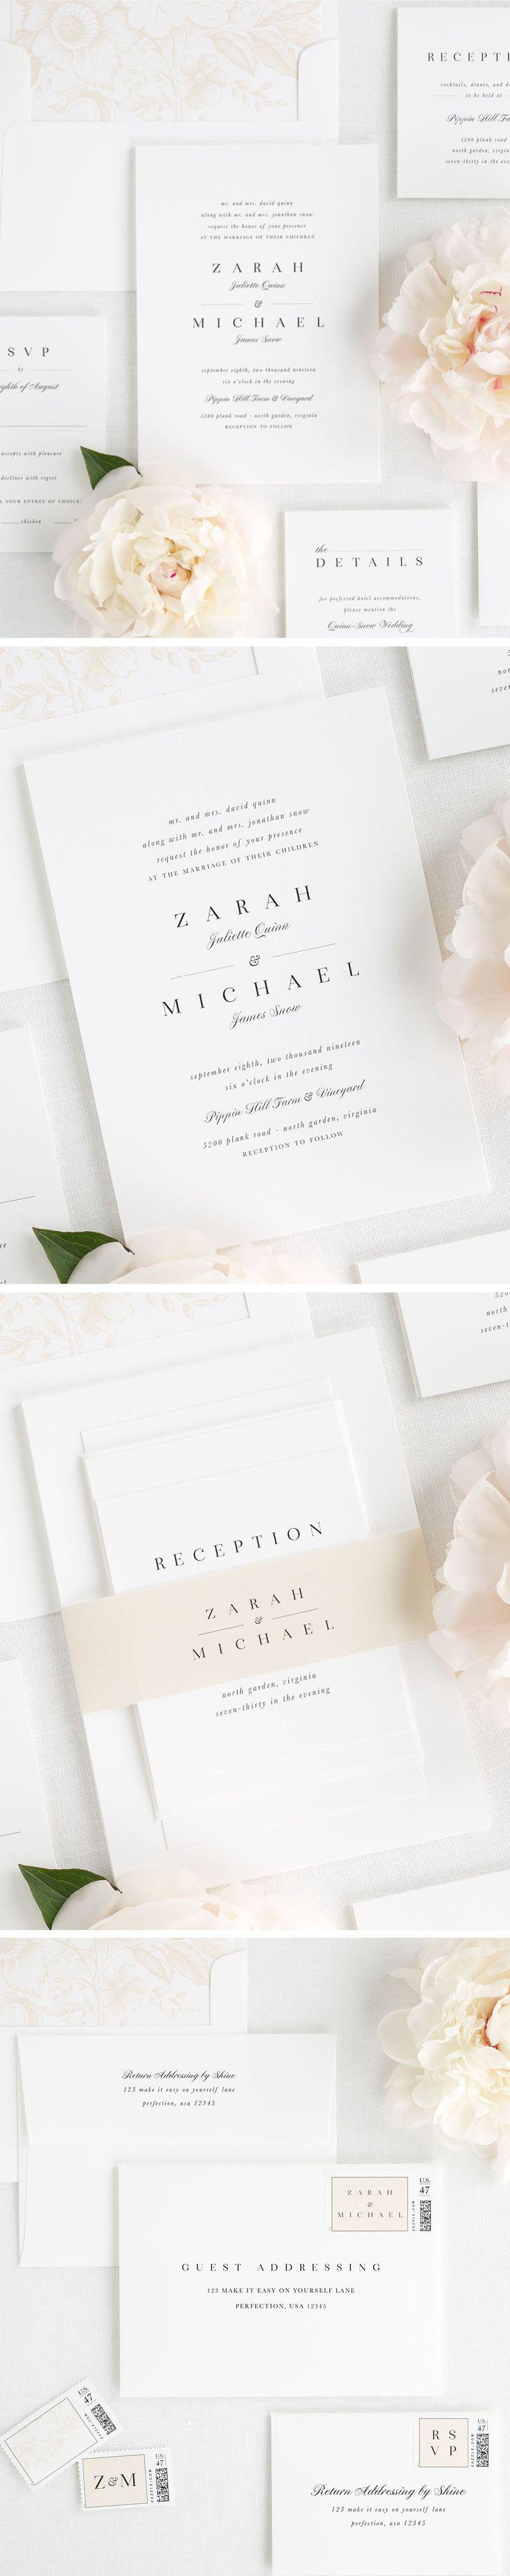 4590 best Wedding Invitation Design images on Pinterest ...